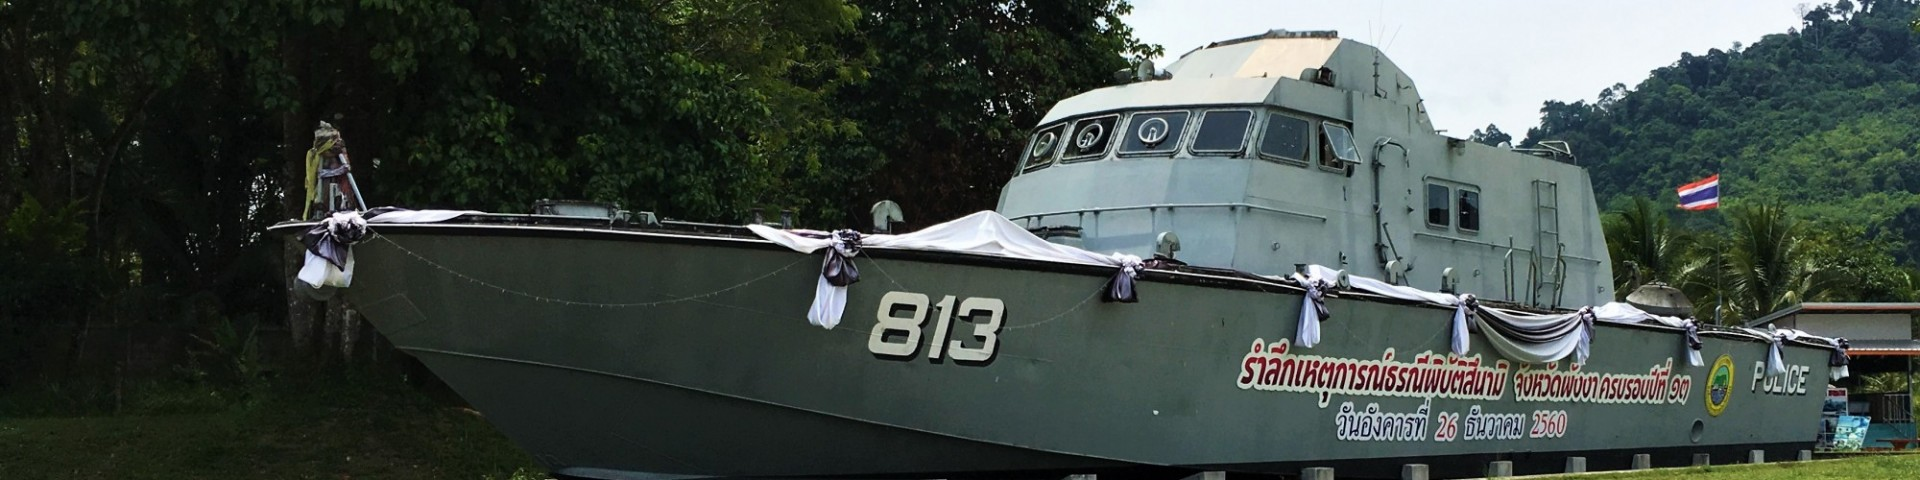 Police Boat 813, Khao Lak, Tsunami